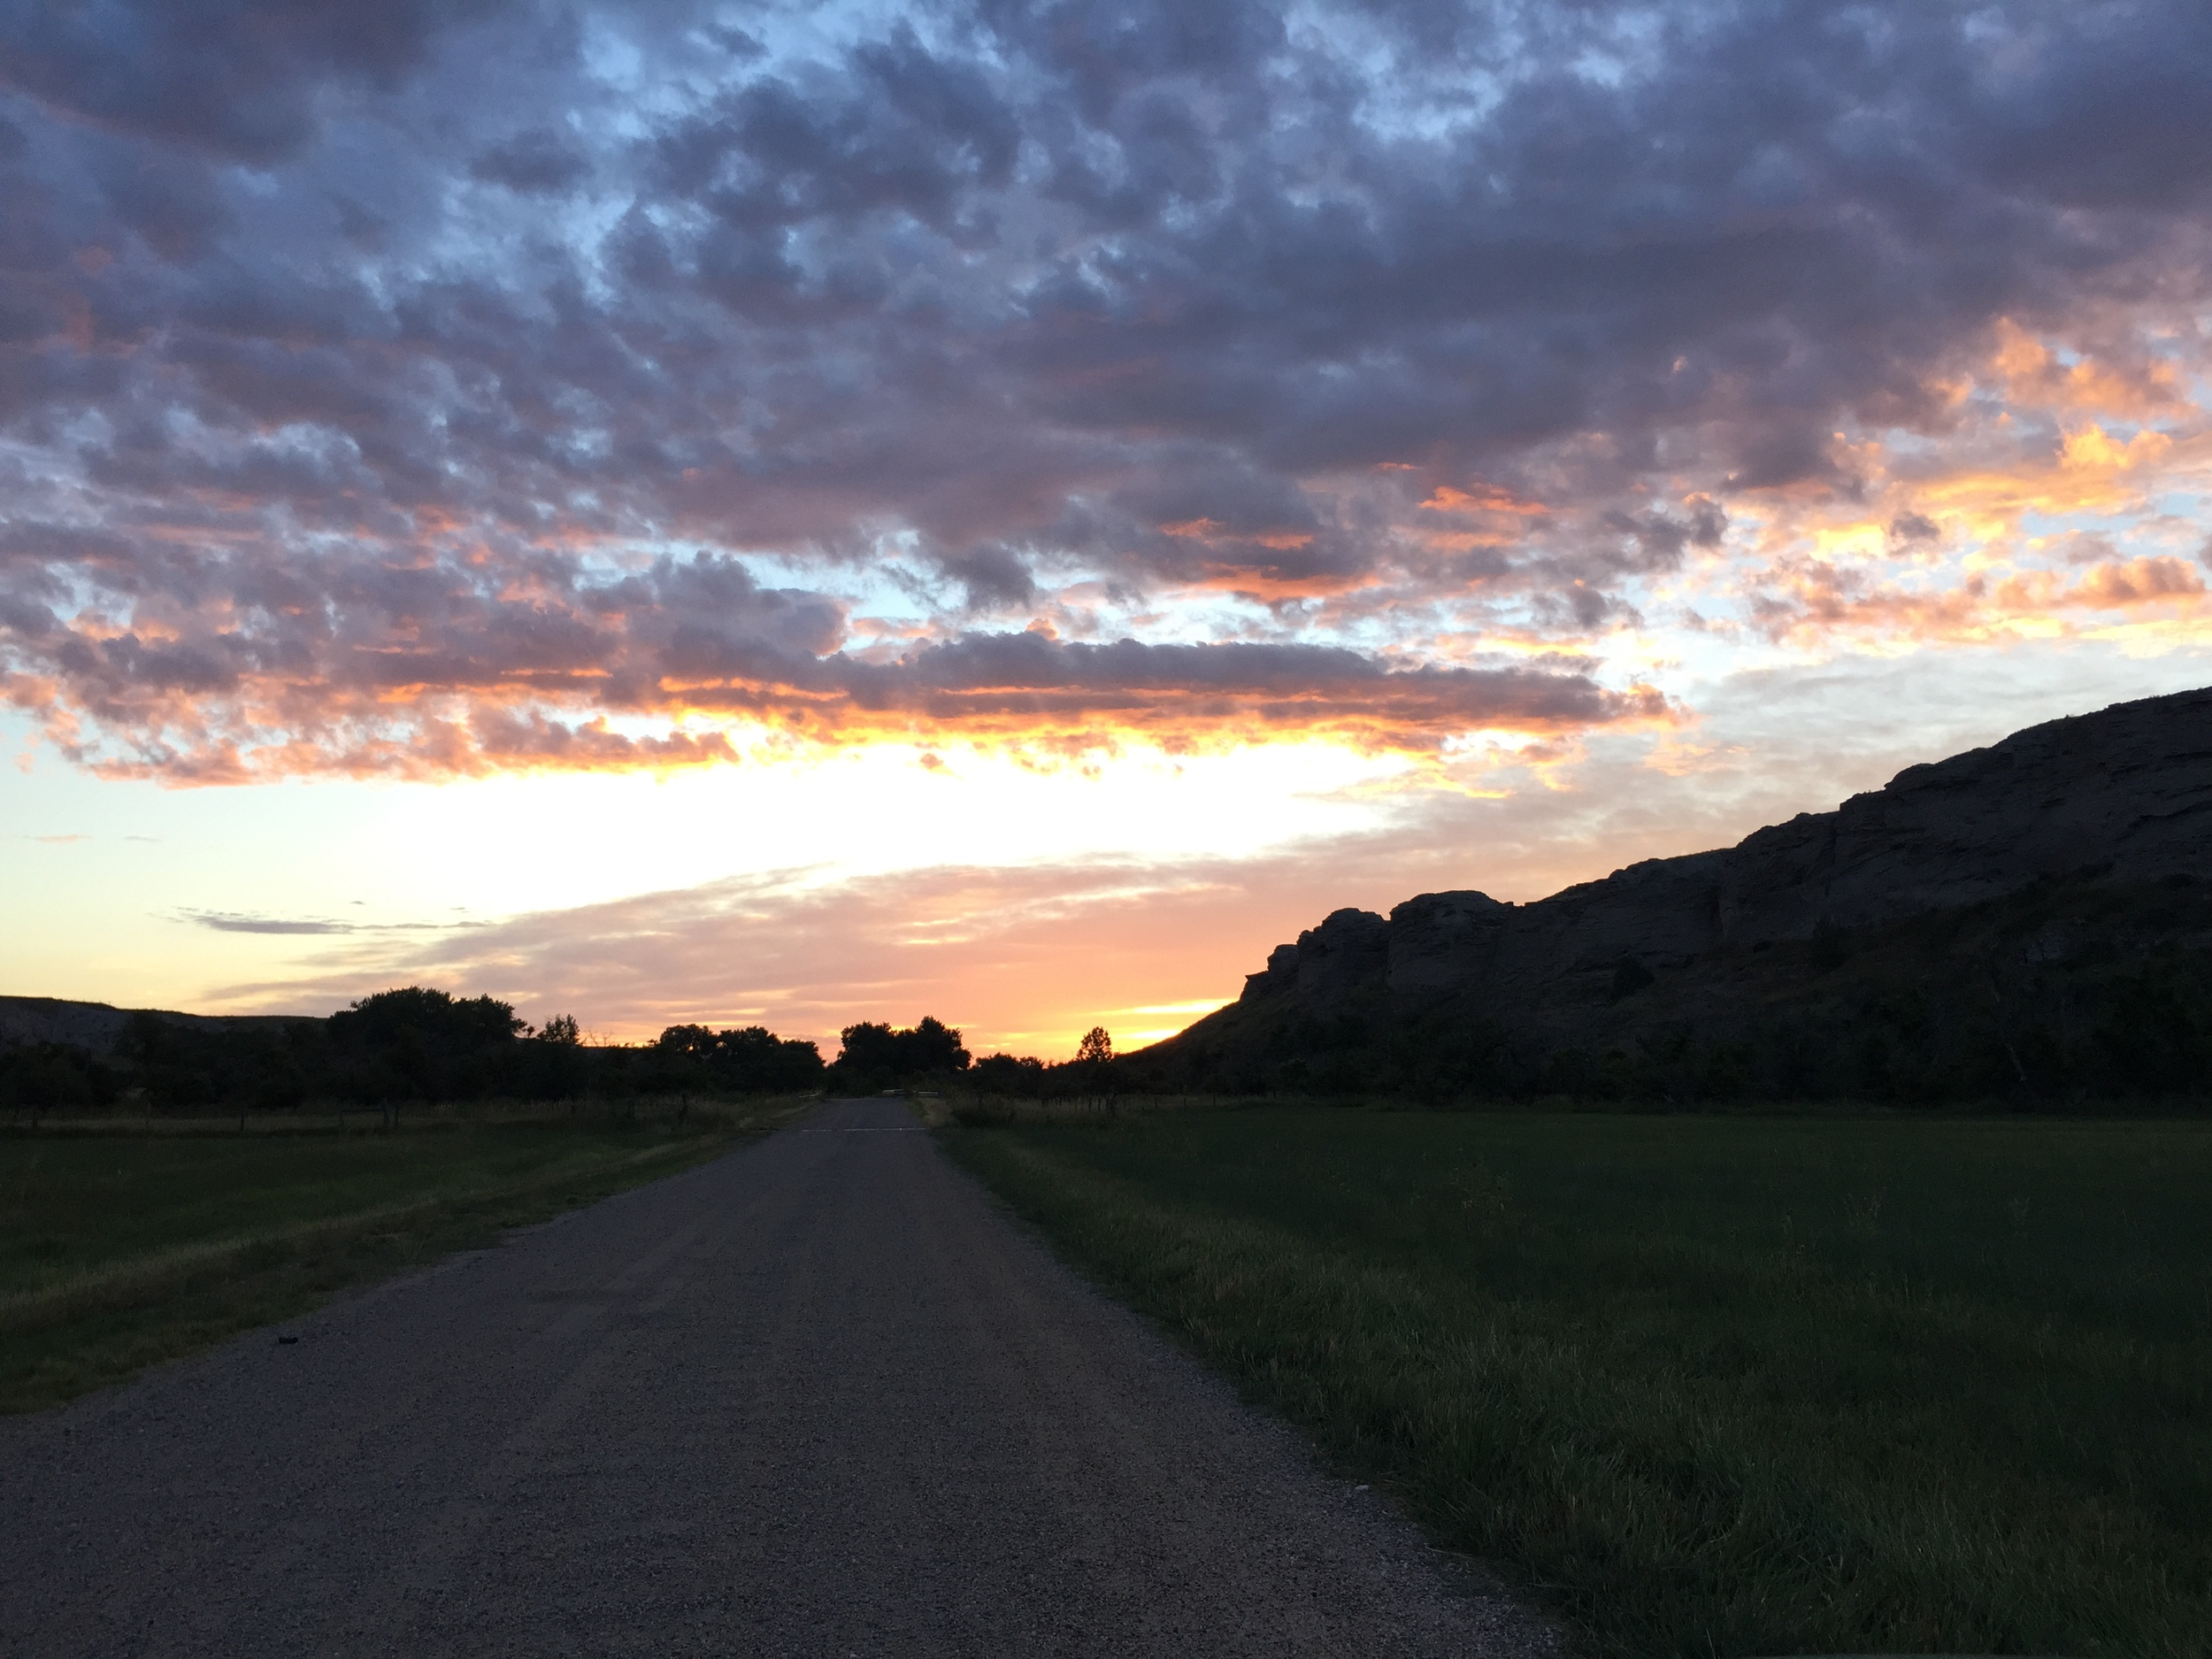 Leaving as the sunrises